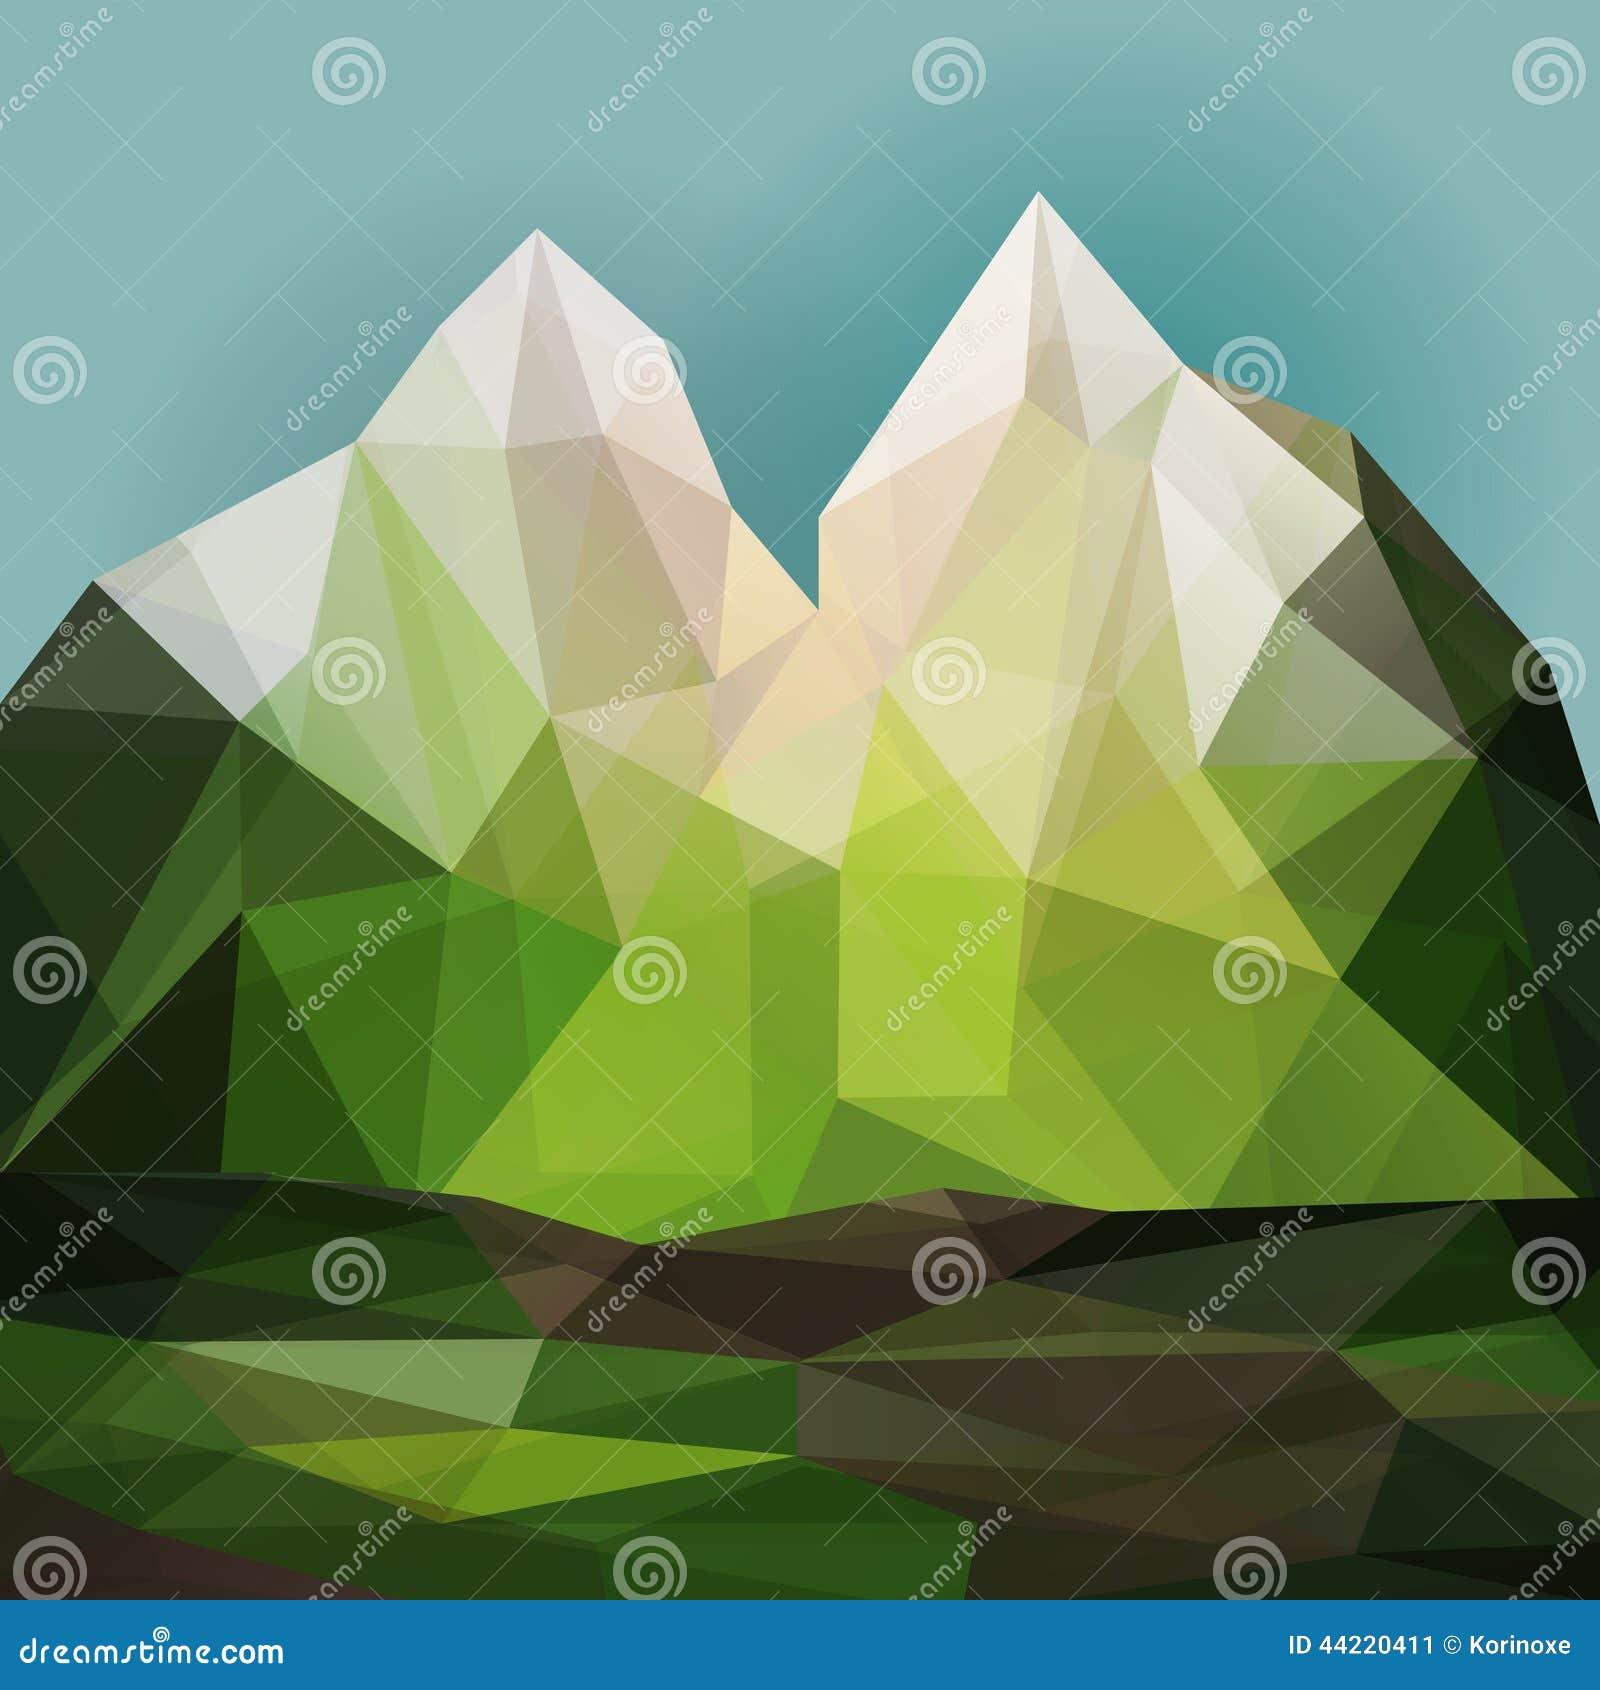 Landscape Illustration Vector Free: Green Mountain Landscape Stock Vector